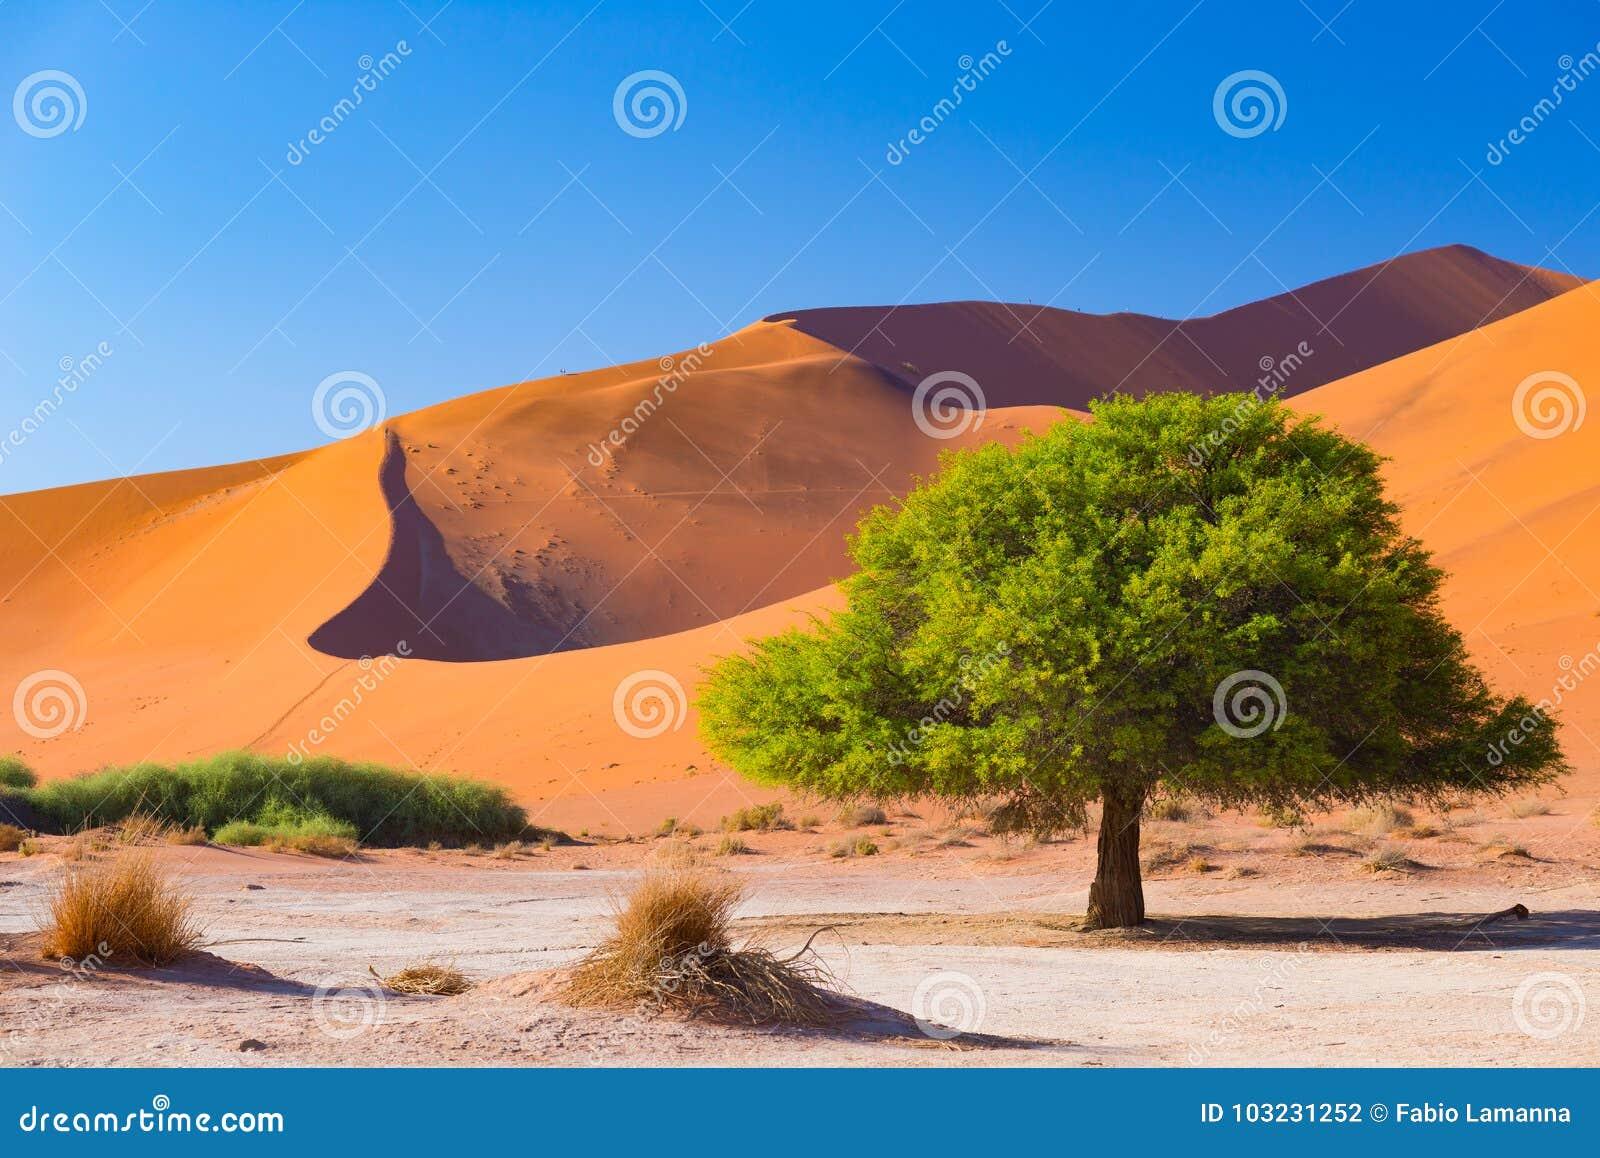 Sossusvlei Namibia, scenic clay salt flat with braided Acacia trees and majestic sand dunes. Namib Naukluft National Park, travel